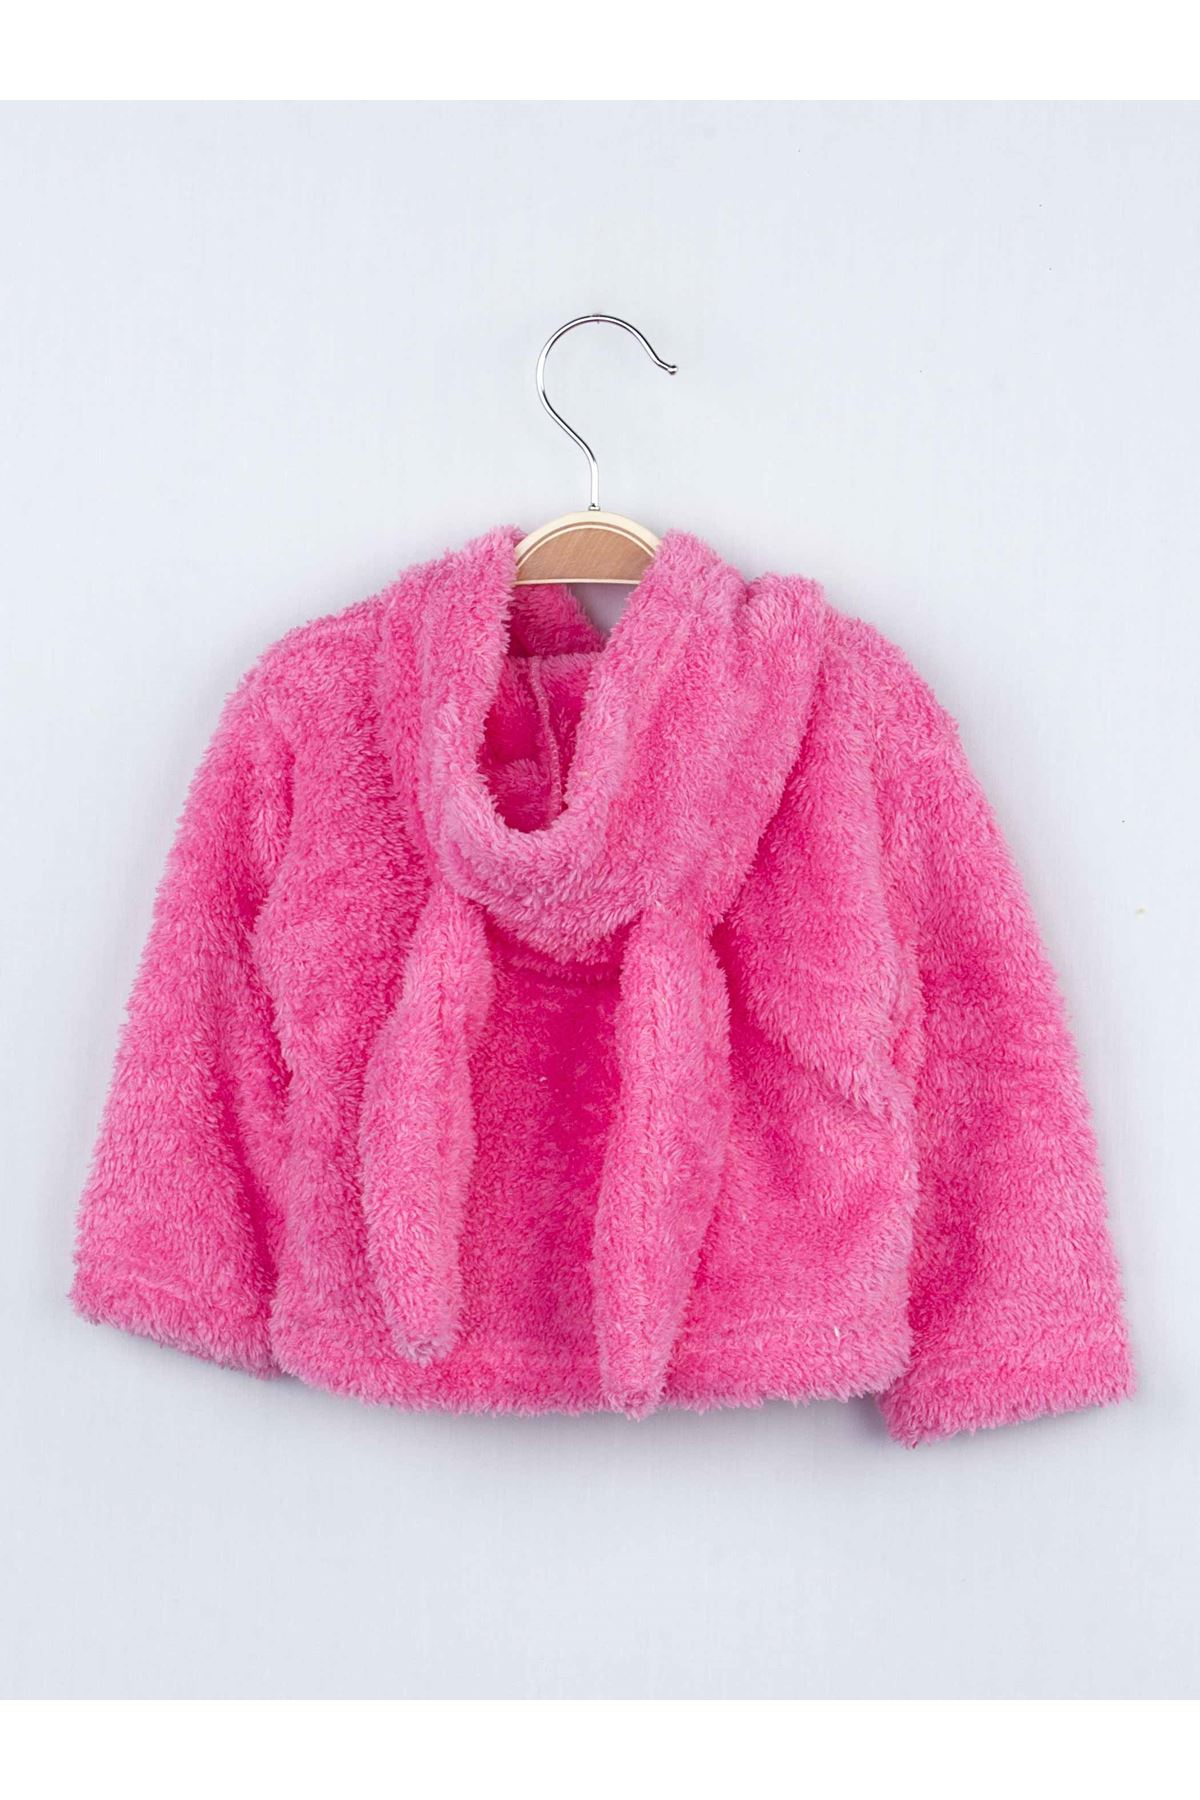 Fuchsia Winter Plush Bag Female Child The Tights suit